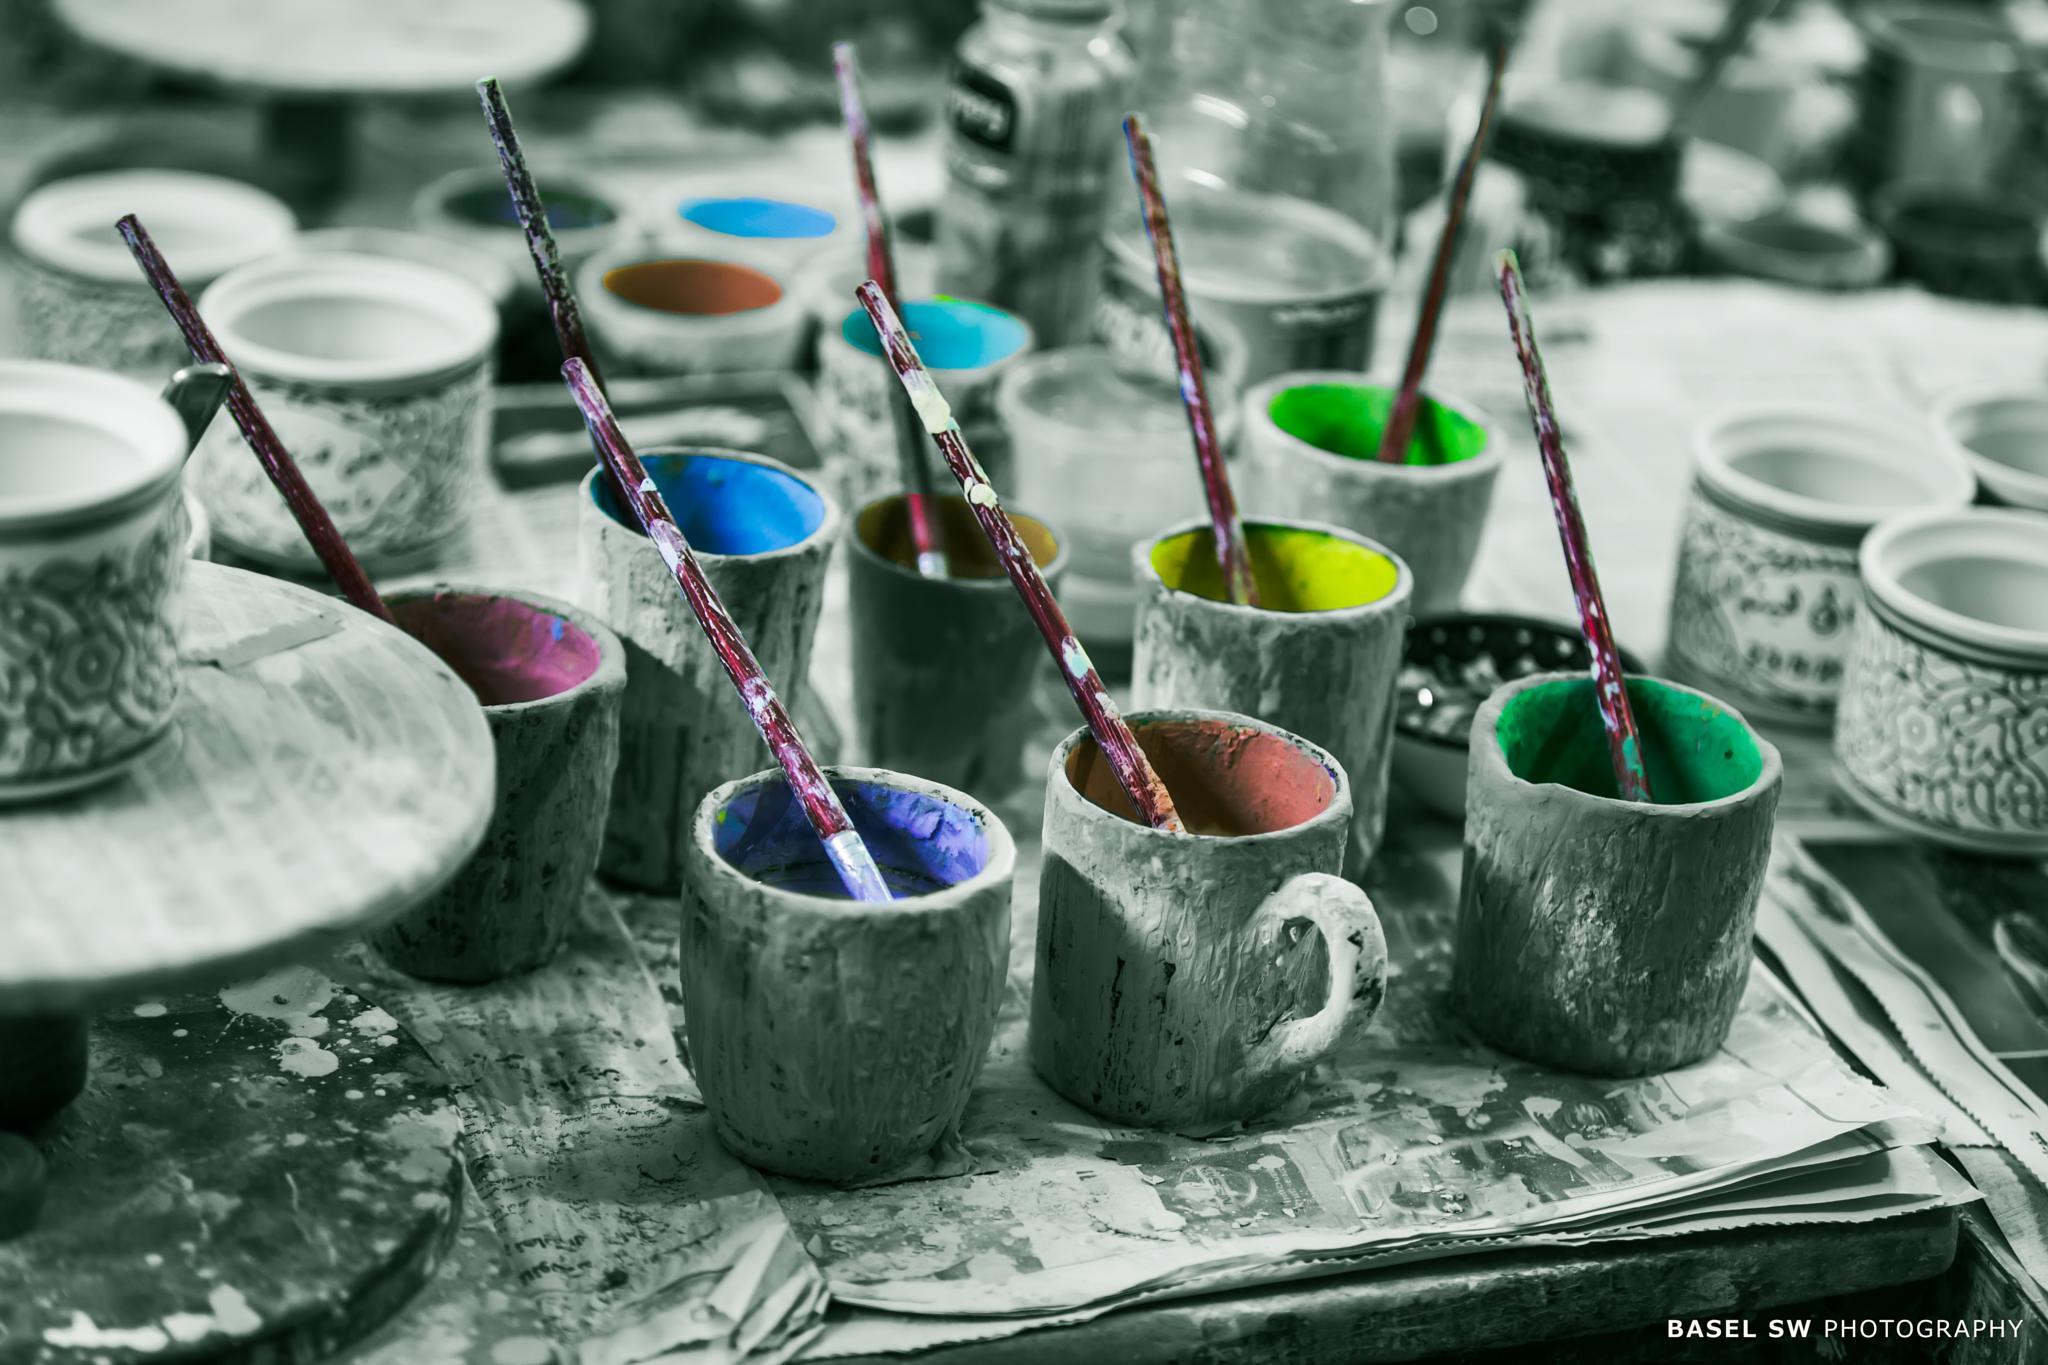 COLORES by basel.m.sawalhi